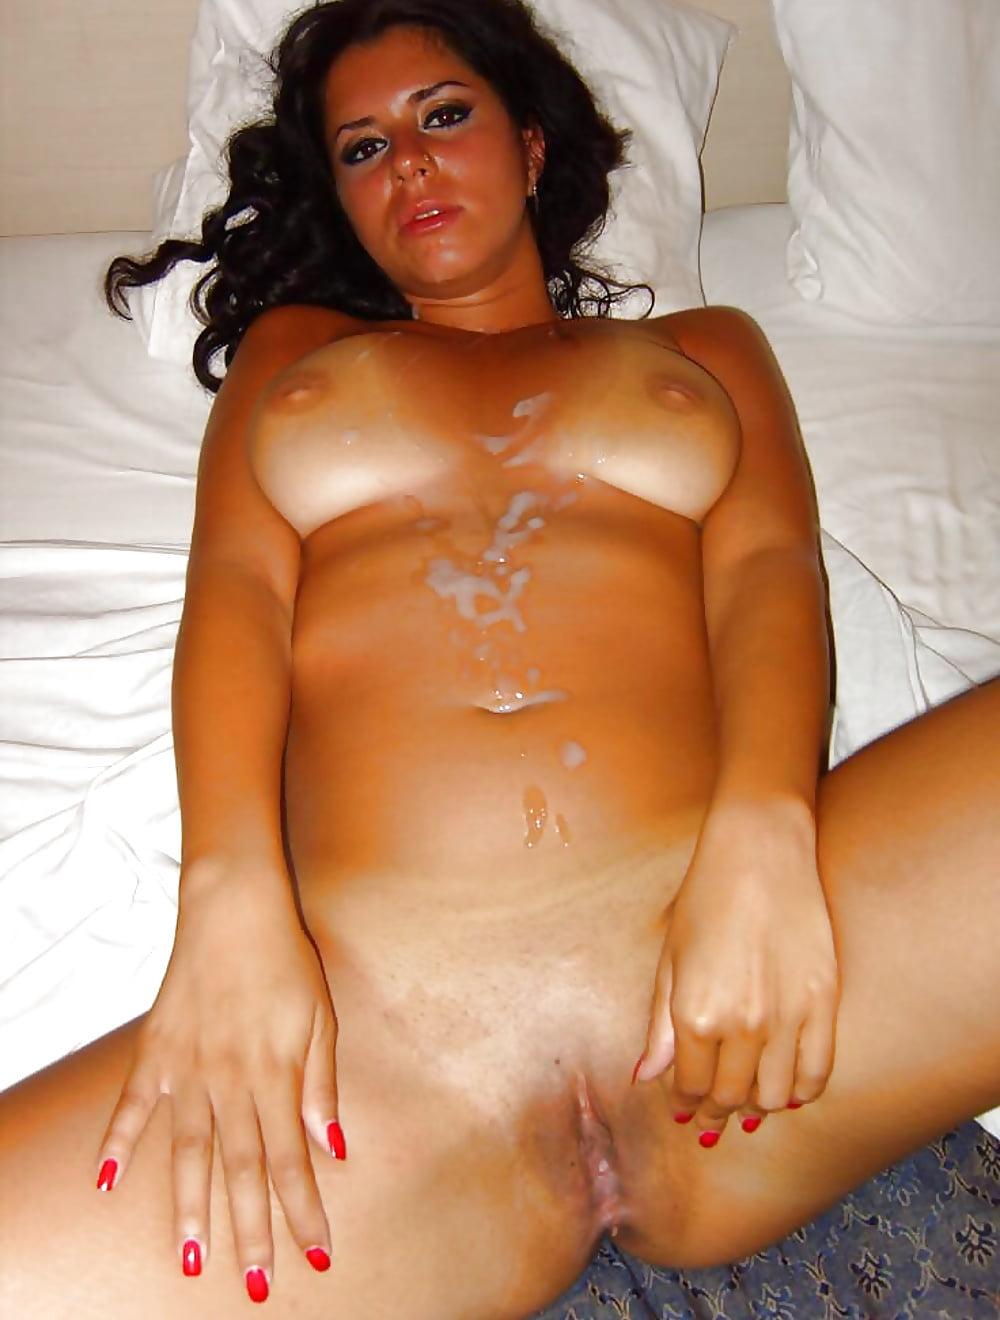 Hotties latina milfs nude #7